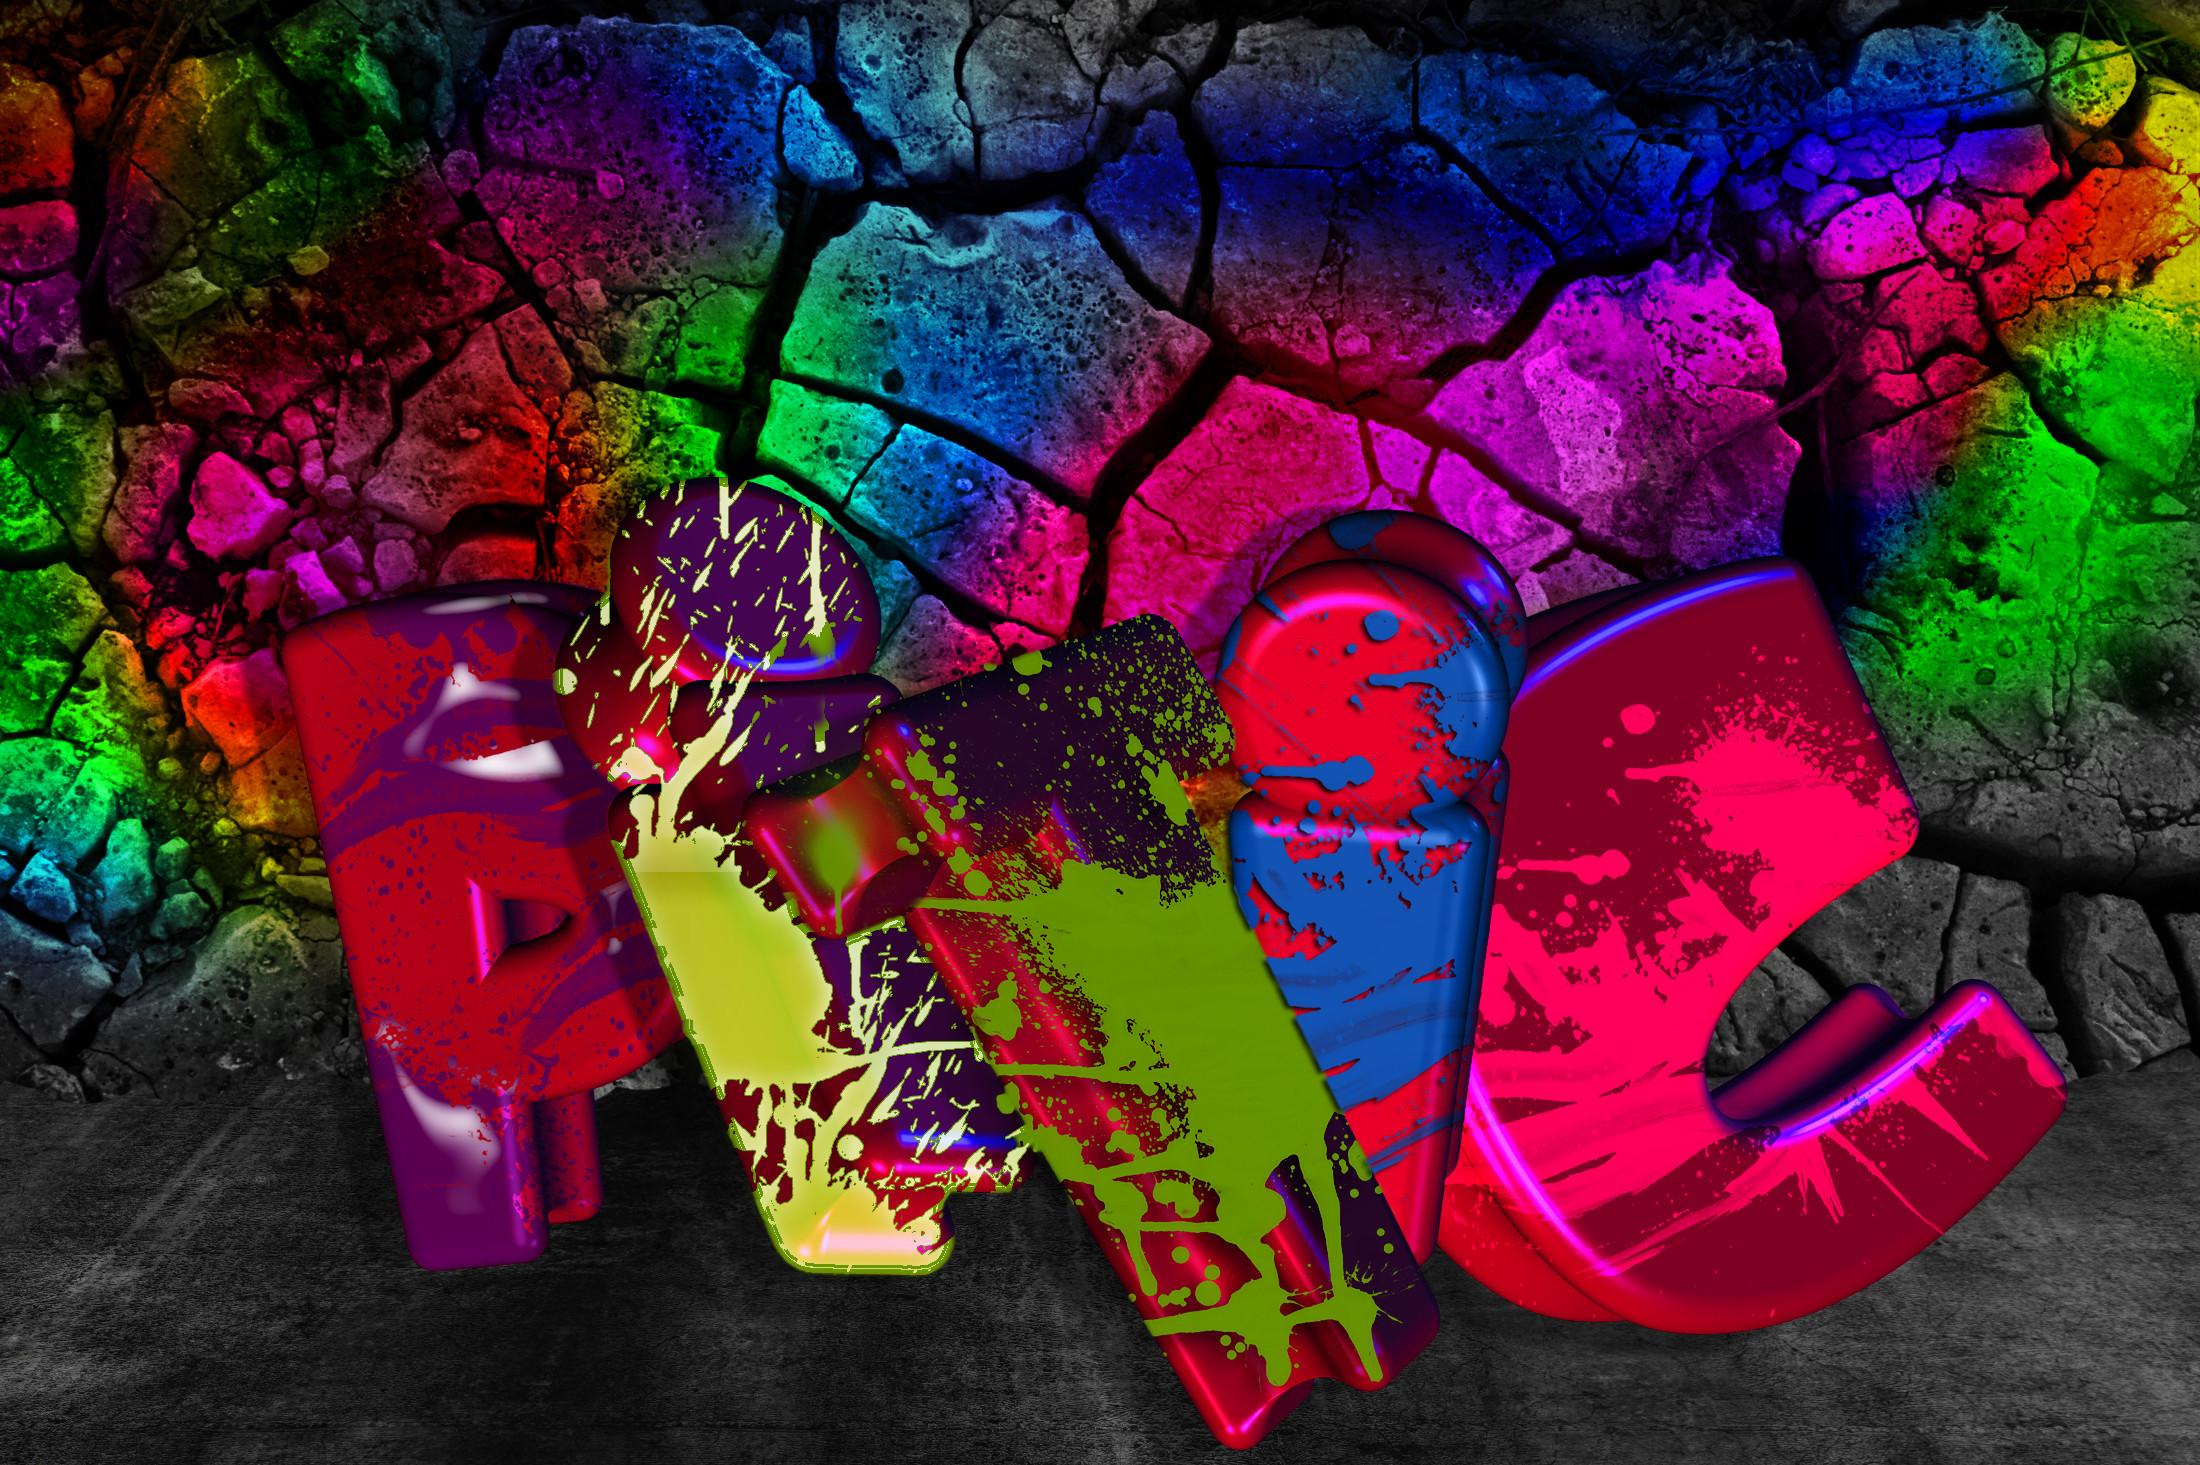 Download Free Graffiti Wallpaper Images For Laptop & Desktops